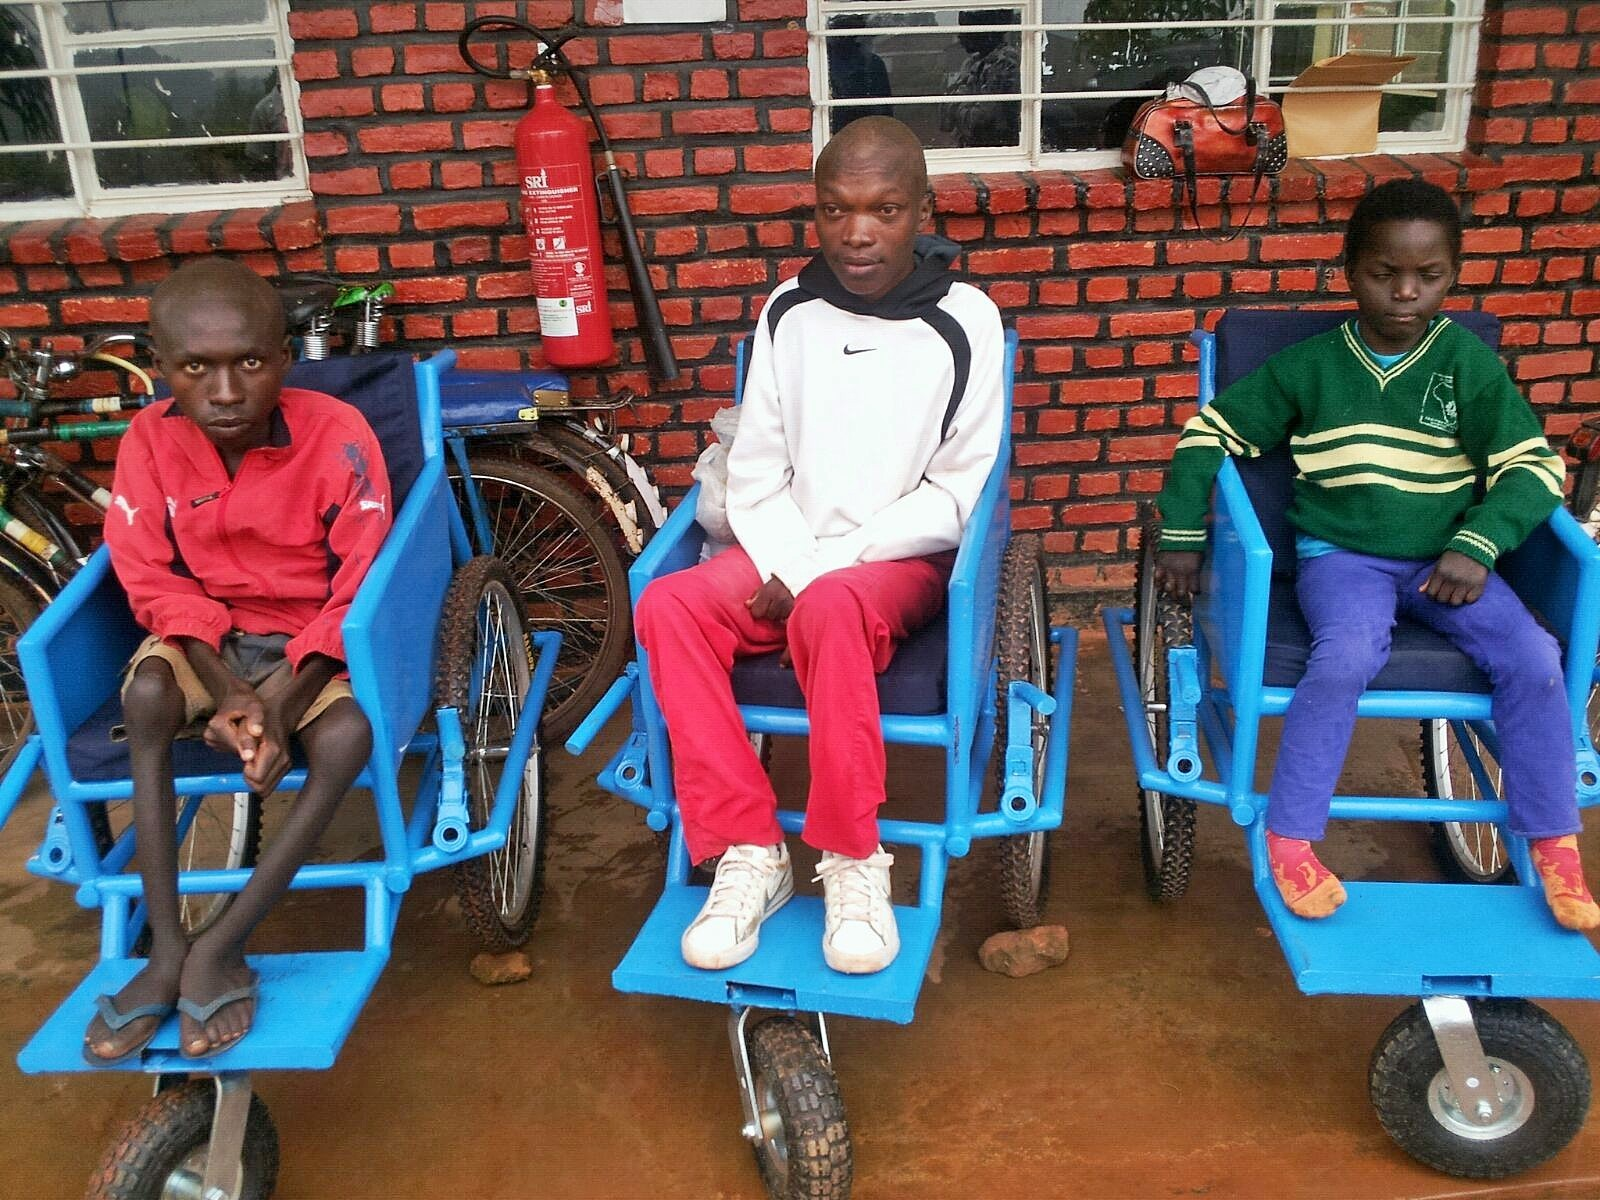 Wheelchairs for Children Program